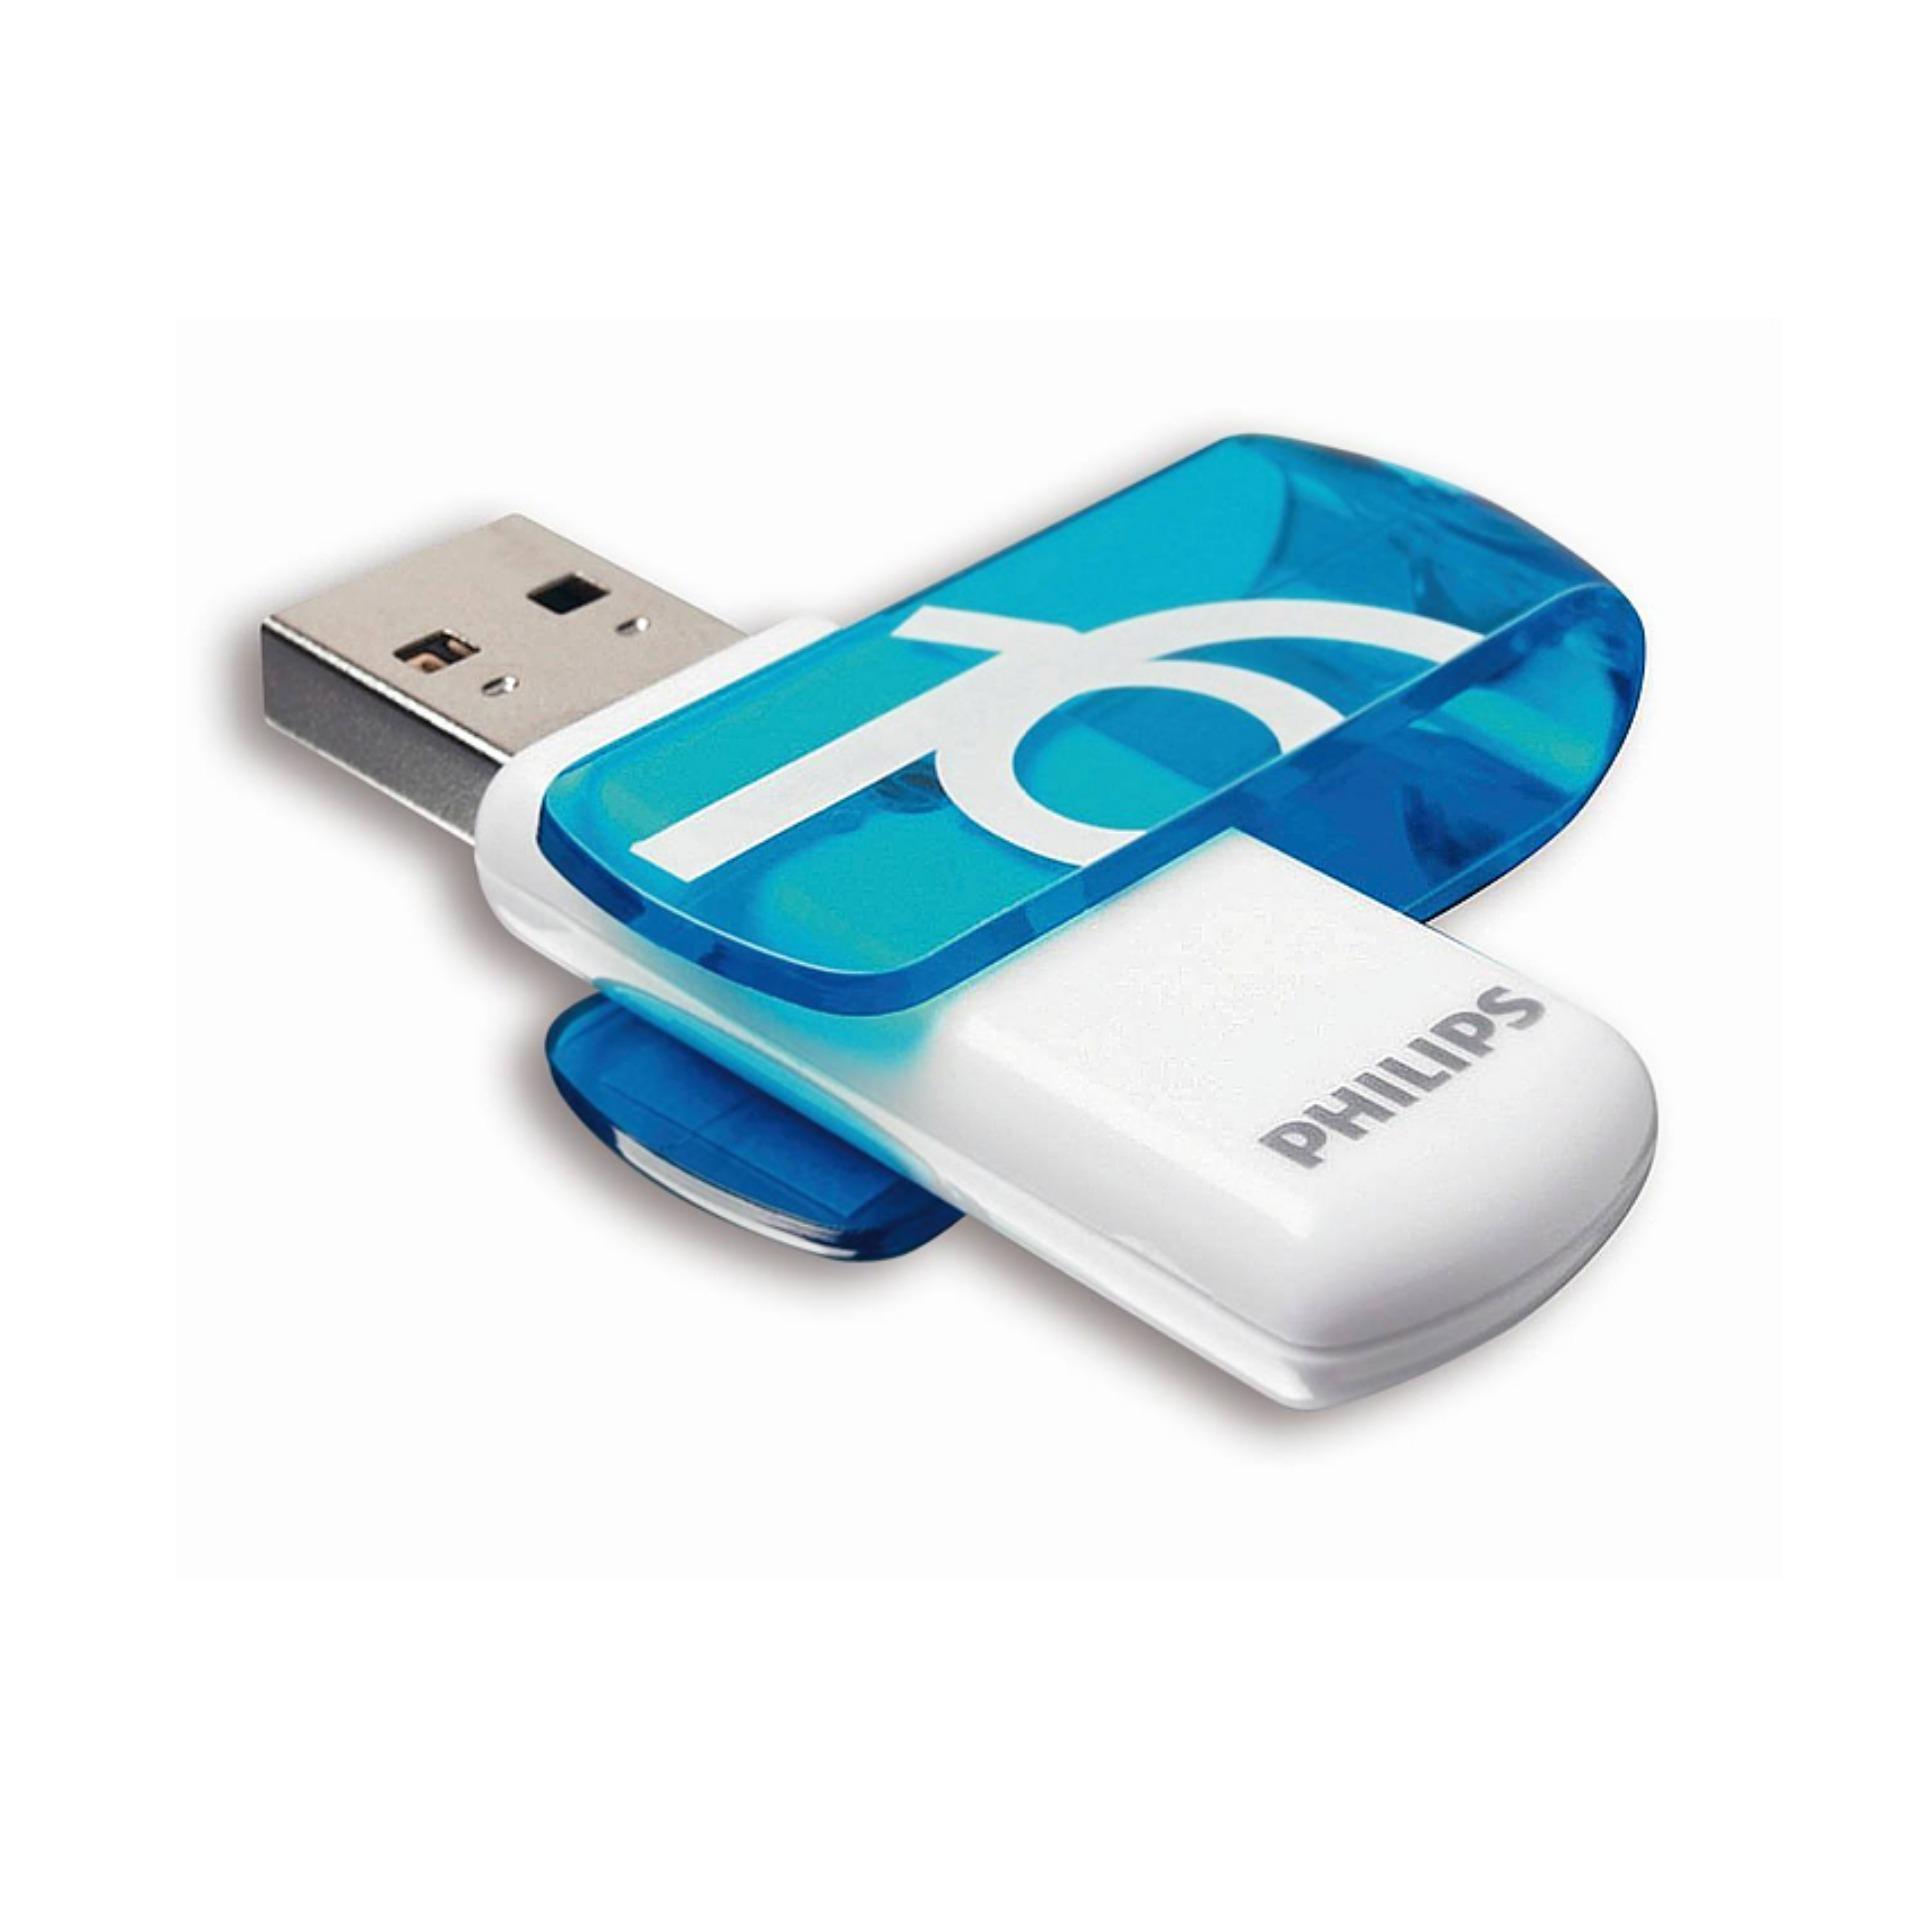 The Price Of Pny Bubble Attache 8gb Usb Flashdrive 2 0 Green Blue Flashdisk Sandisk Blade Philips Vivid 16gb 20